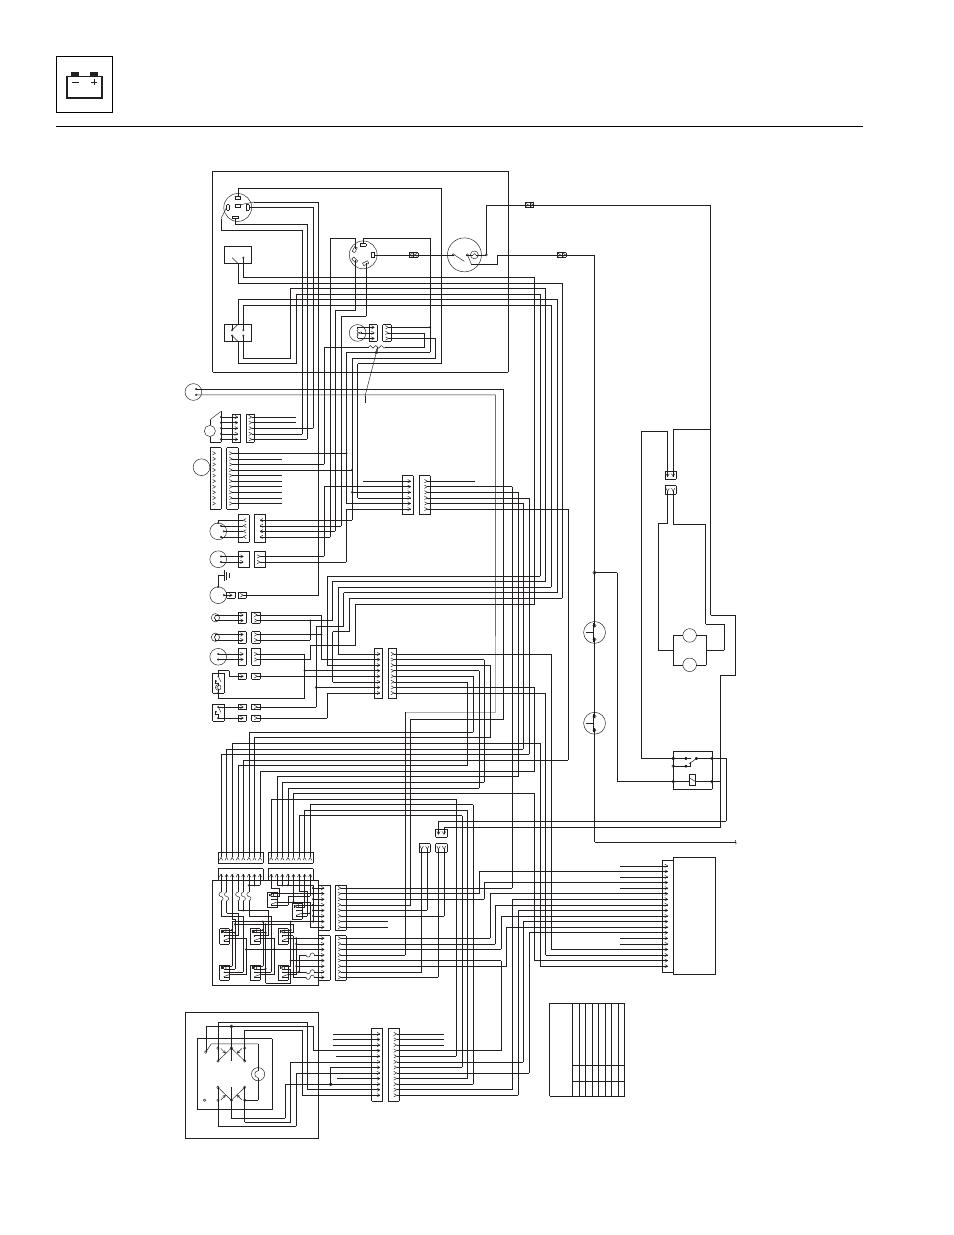 yamaha g12 wiring diagram | wiring diagram 177 cater  farmacia gava